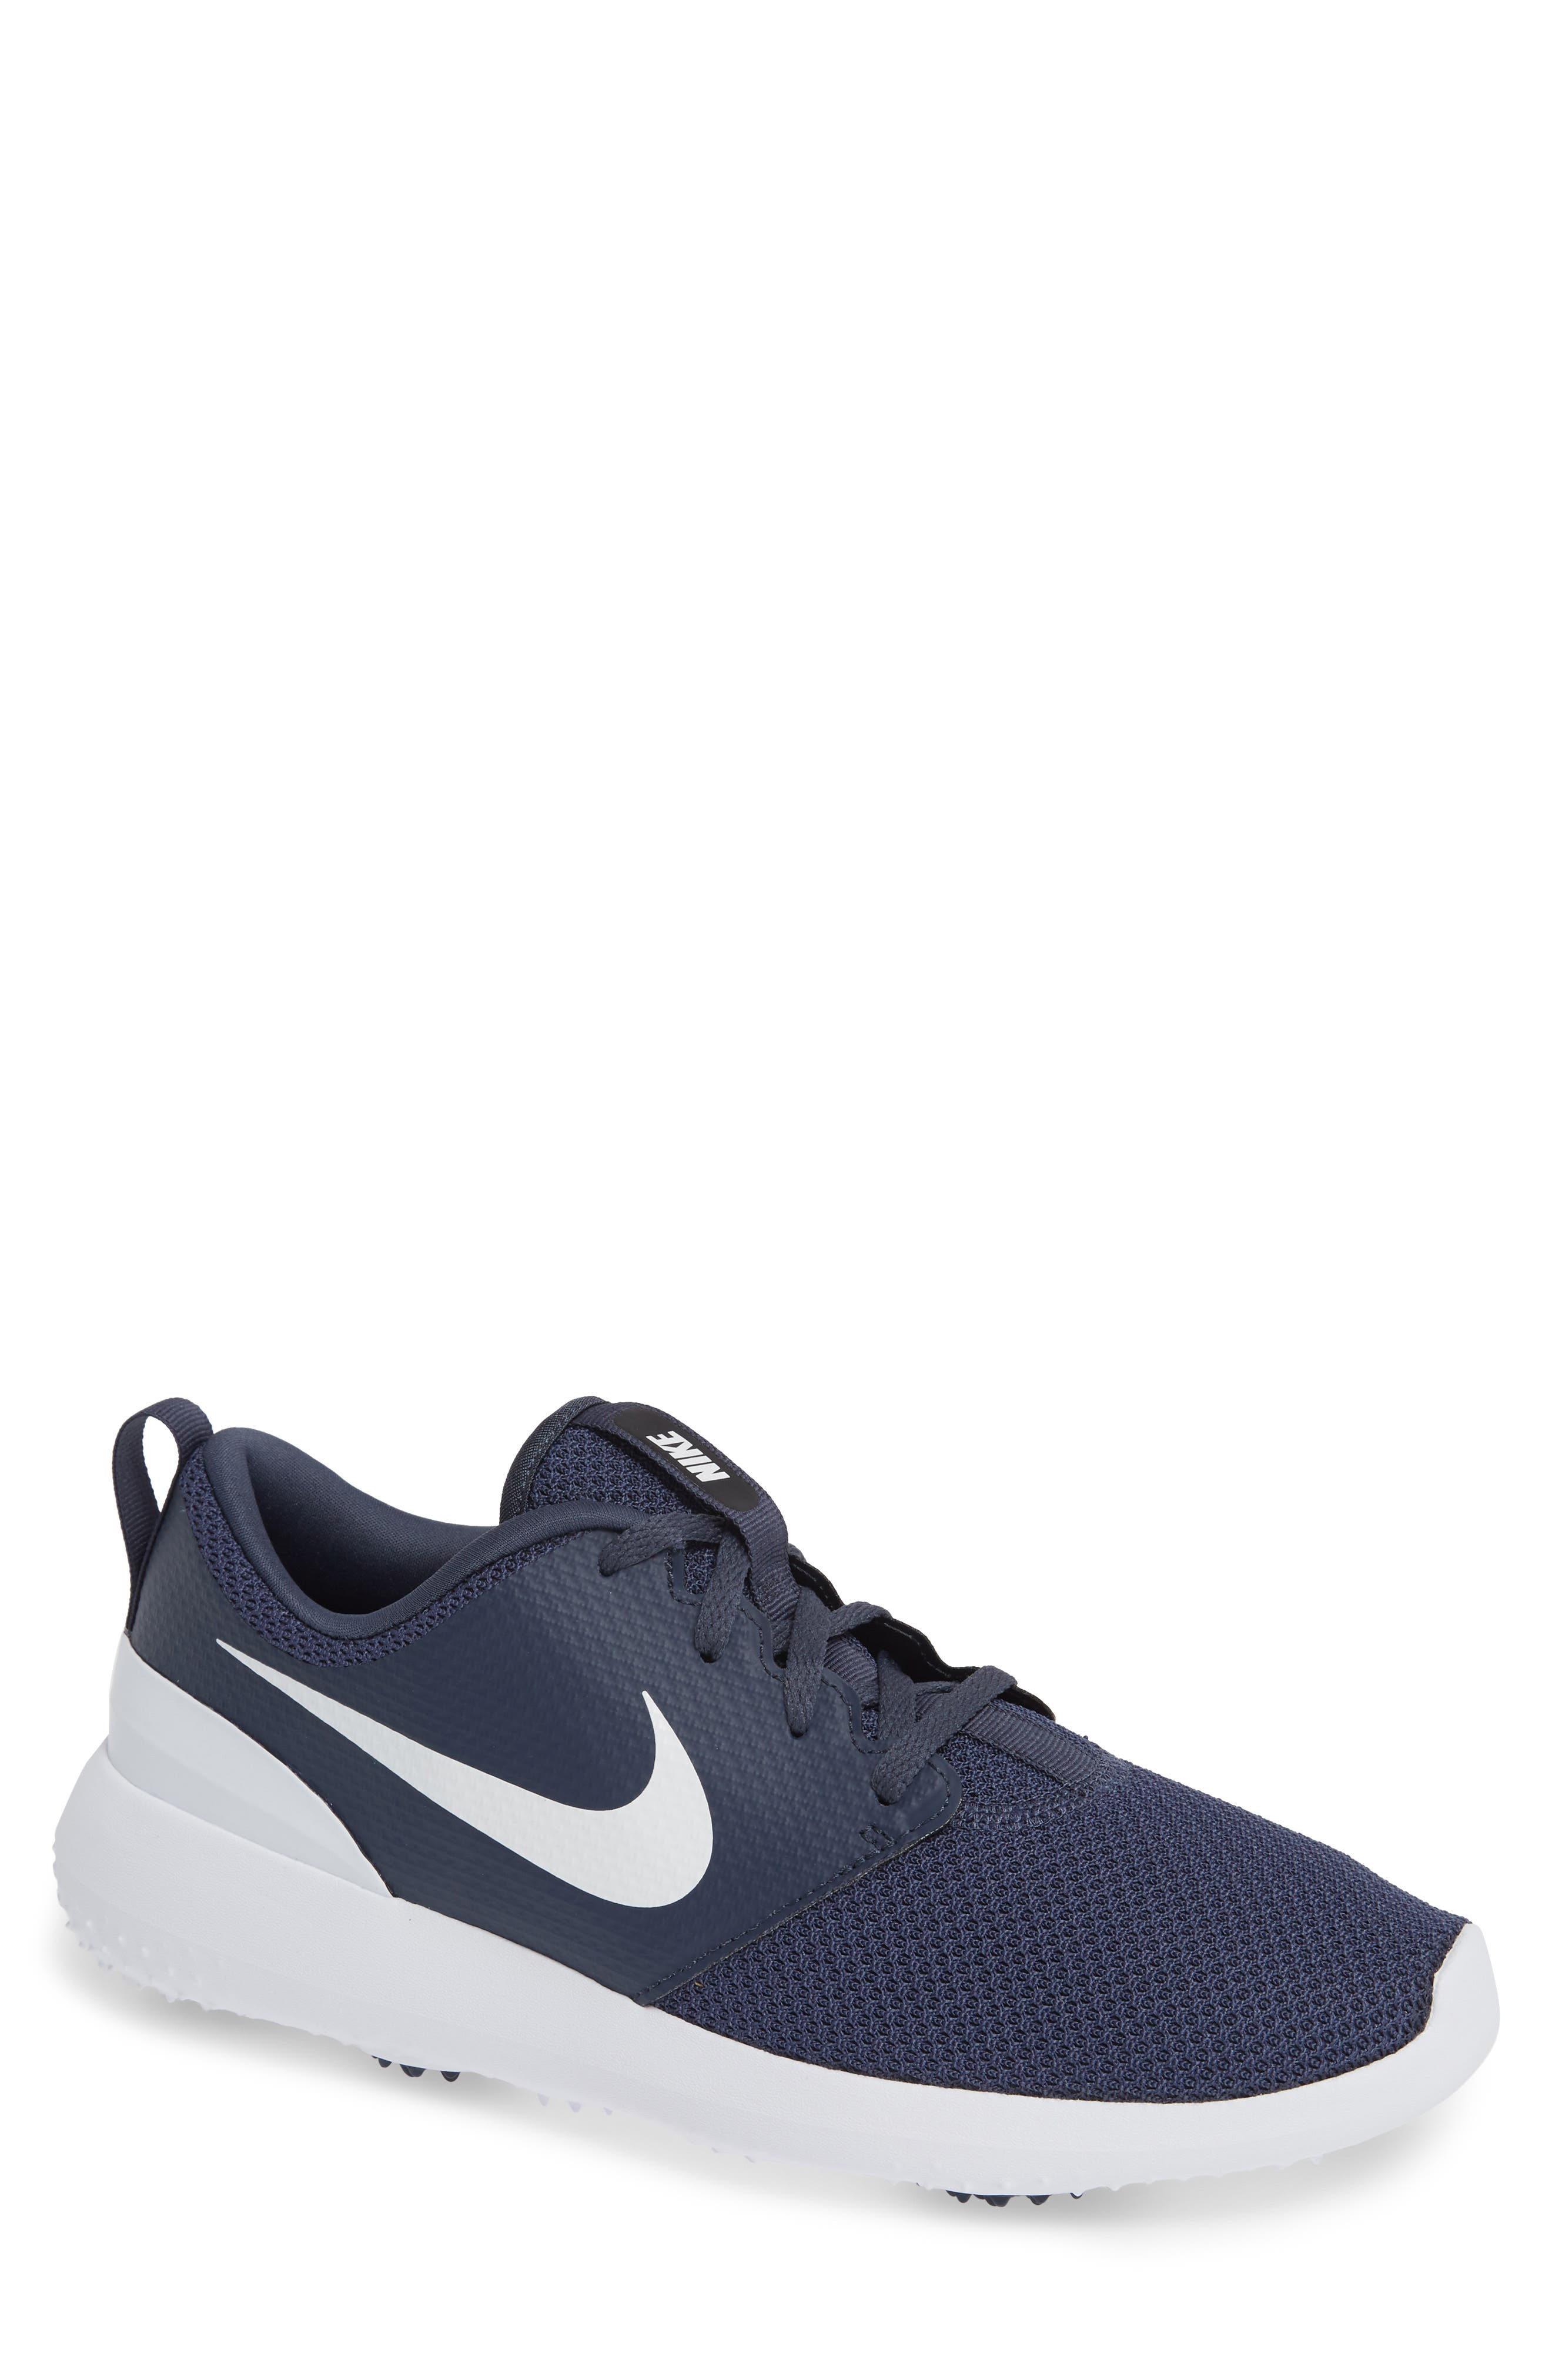 dd7c976594b7f1 Men s Nike Golf Shoes